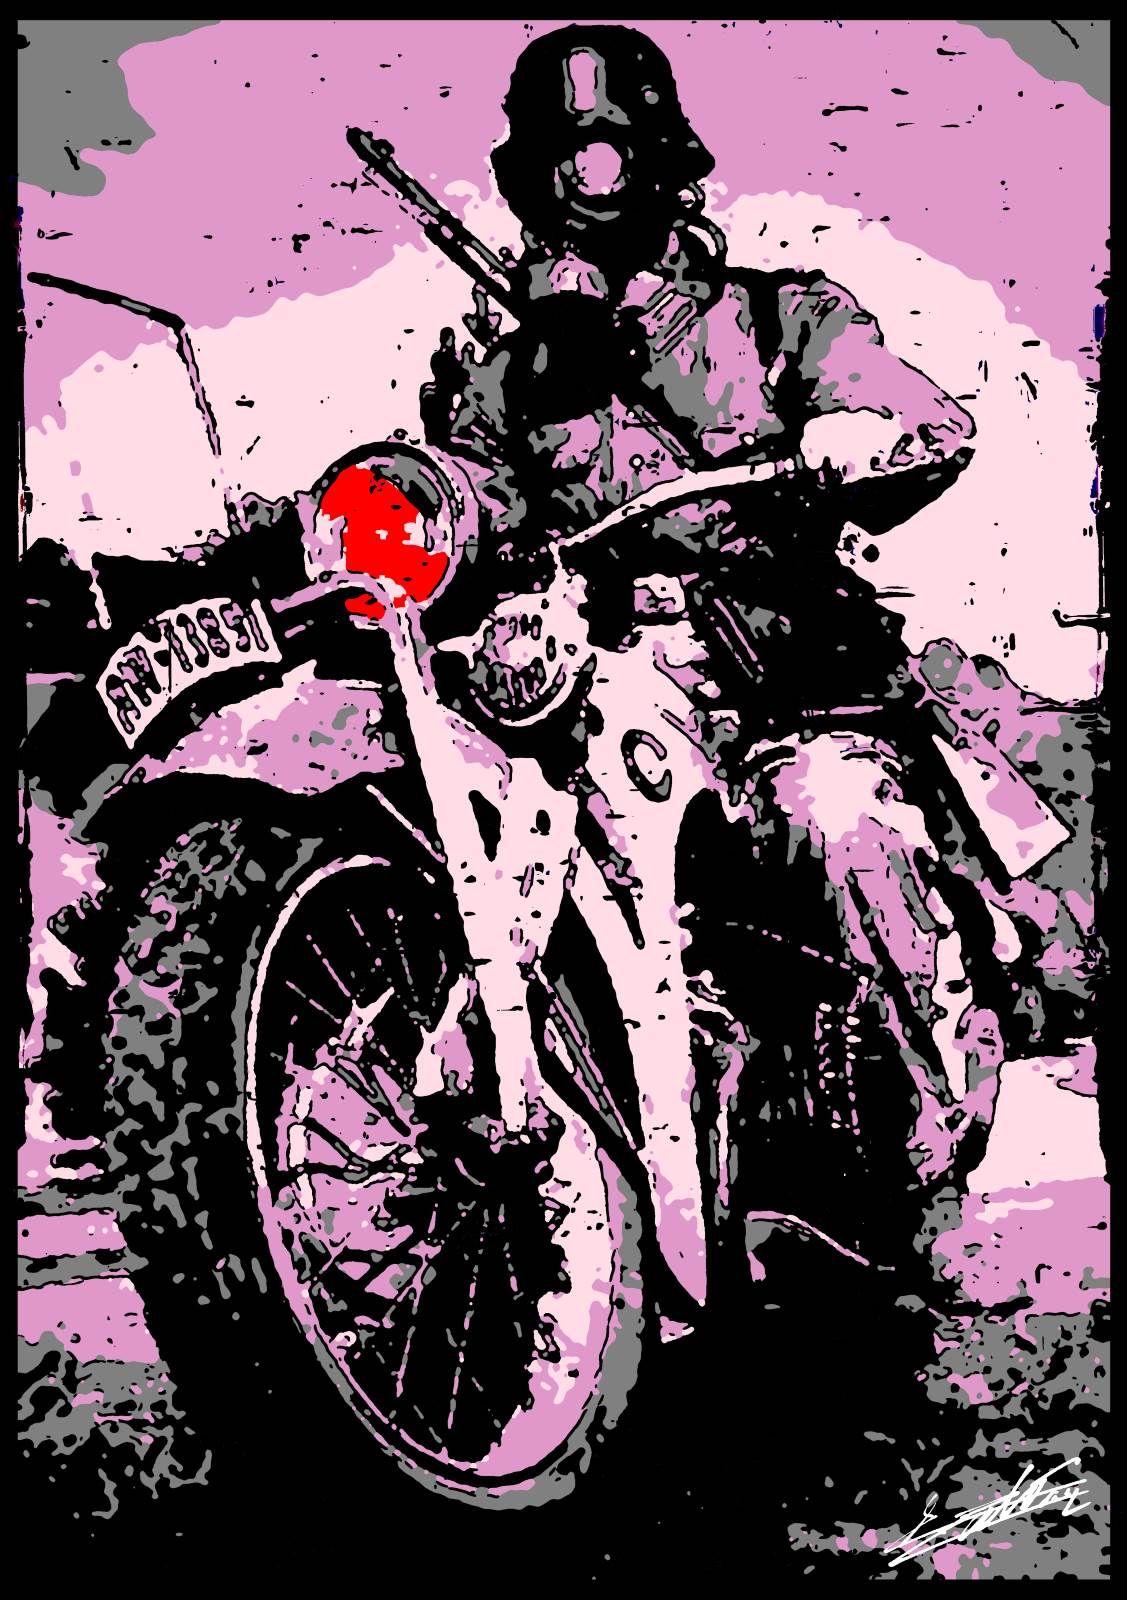 tableau peinture acrylique moderne pop art color moto guerre wwii wehrmacht allemand violet. Black Bedroom Furniture Sets. Home Design Ideas